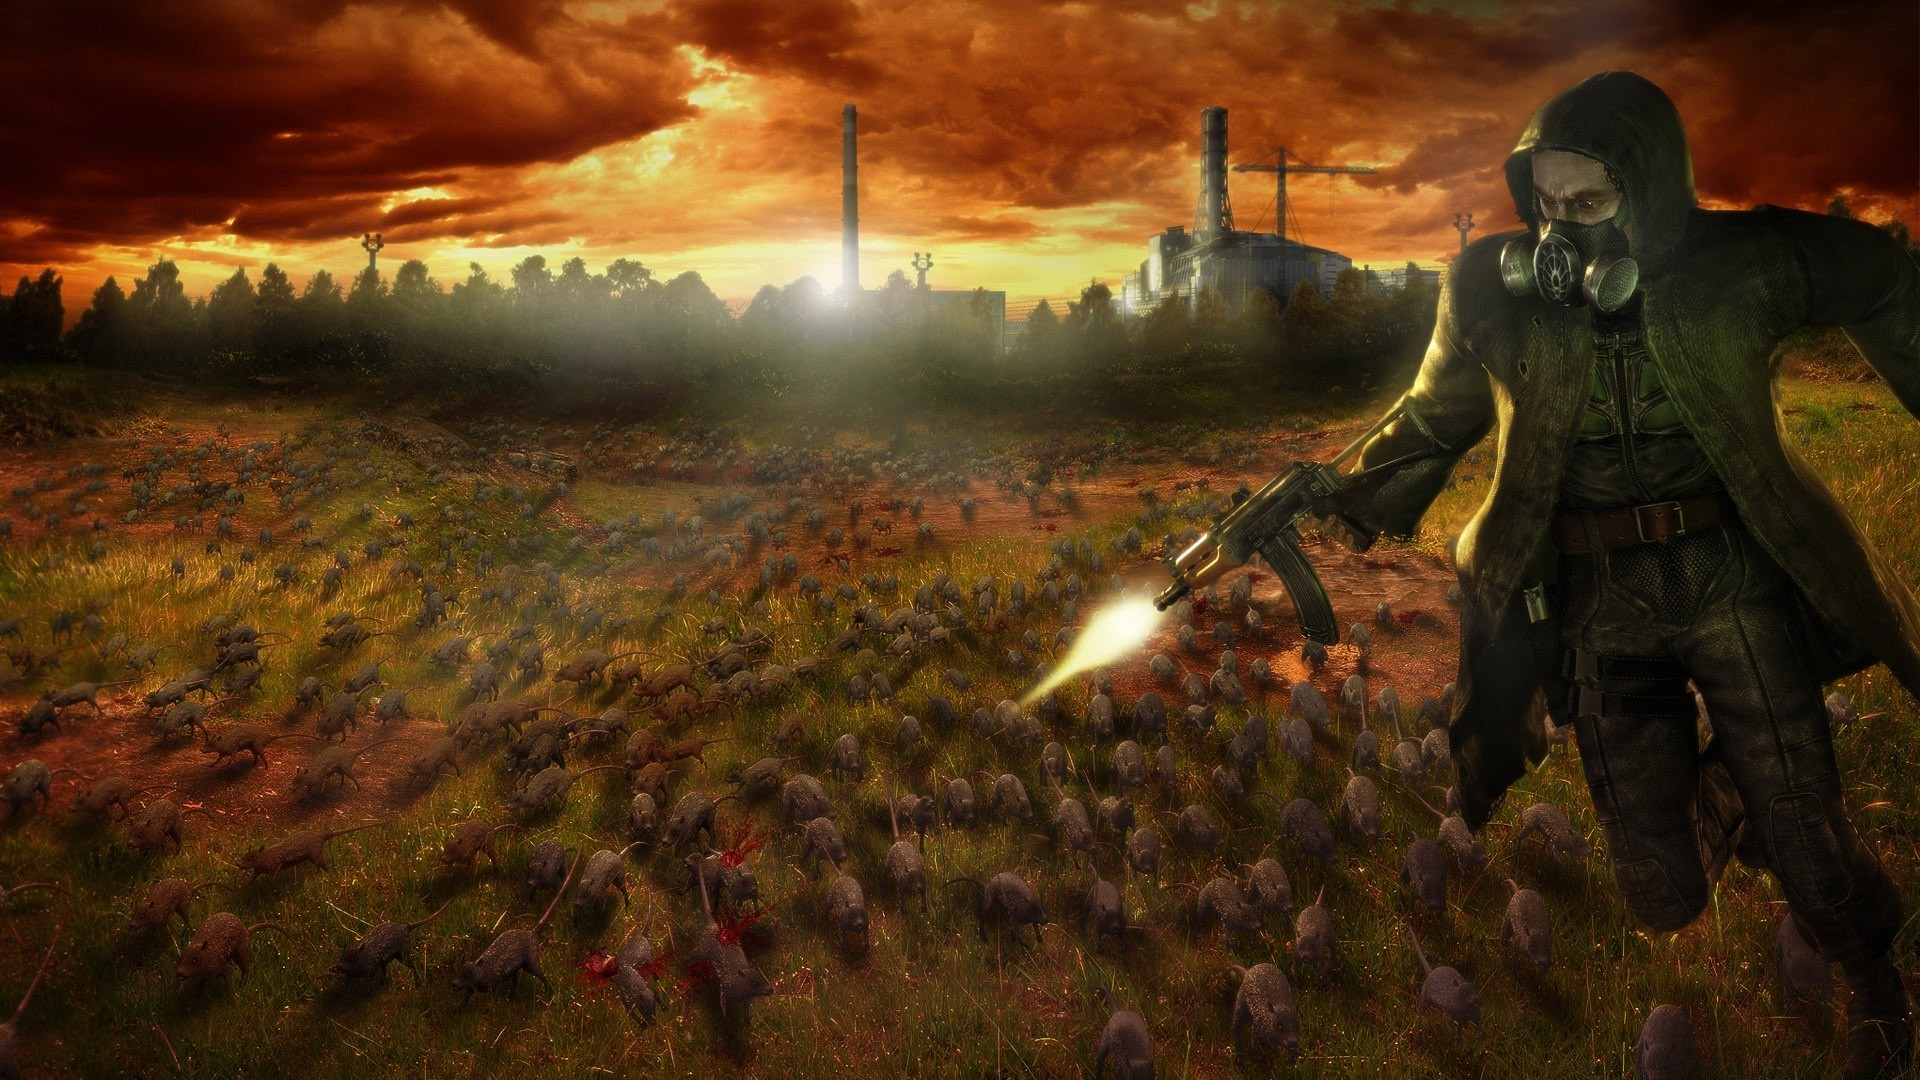 Фанат создает ремейк S.T.A.L.K.E.R. надвижке Unreal Engine 4